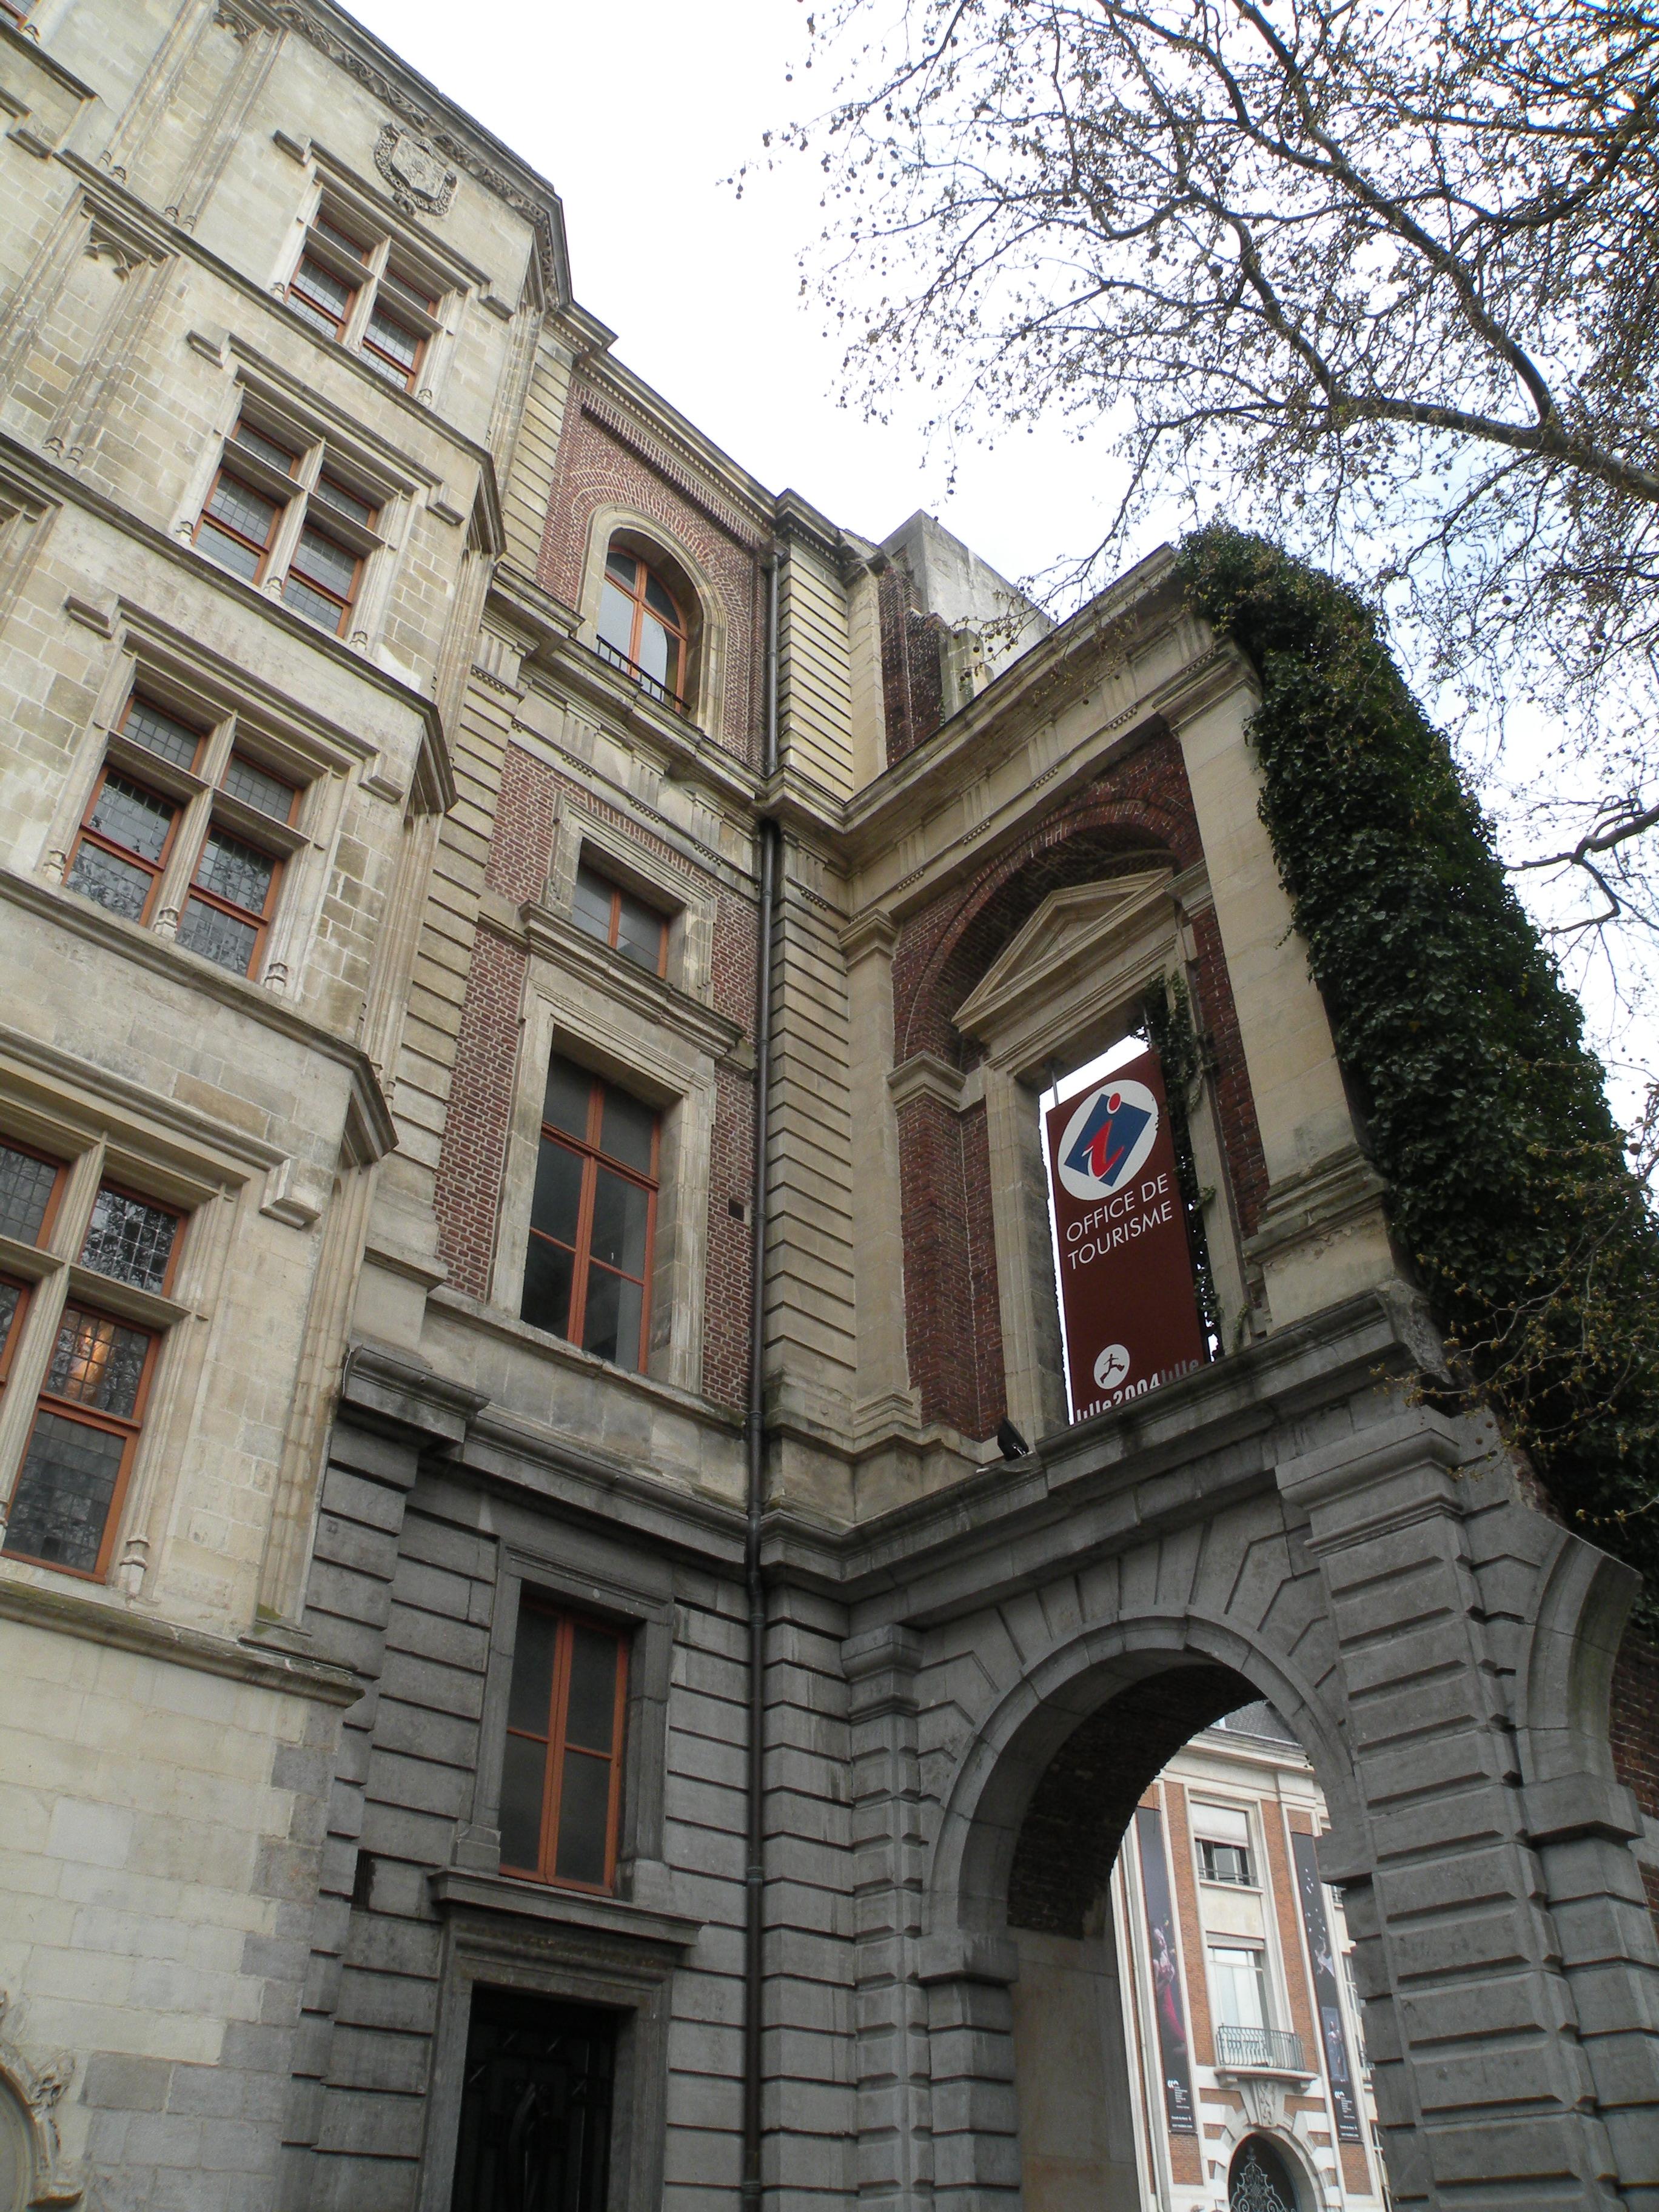 Filelille Palais Rihour Archejpg Wikimedia Commons